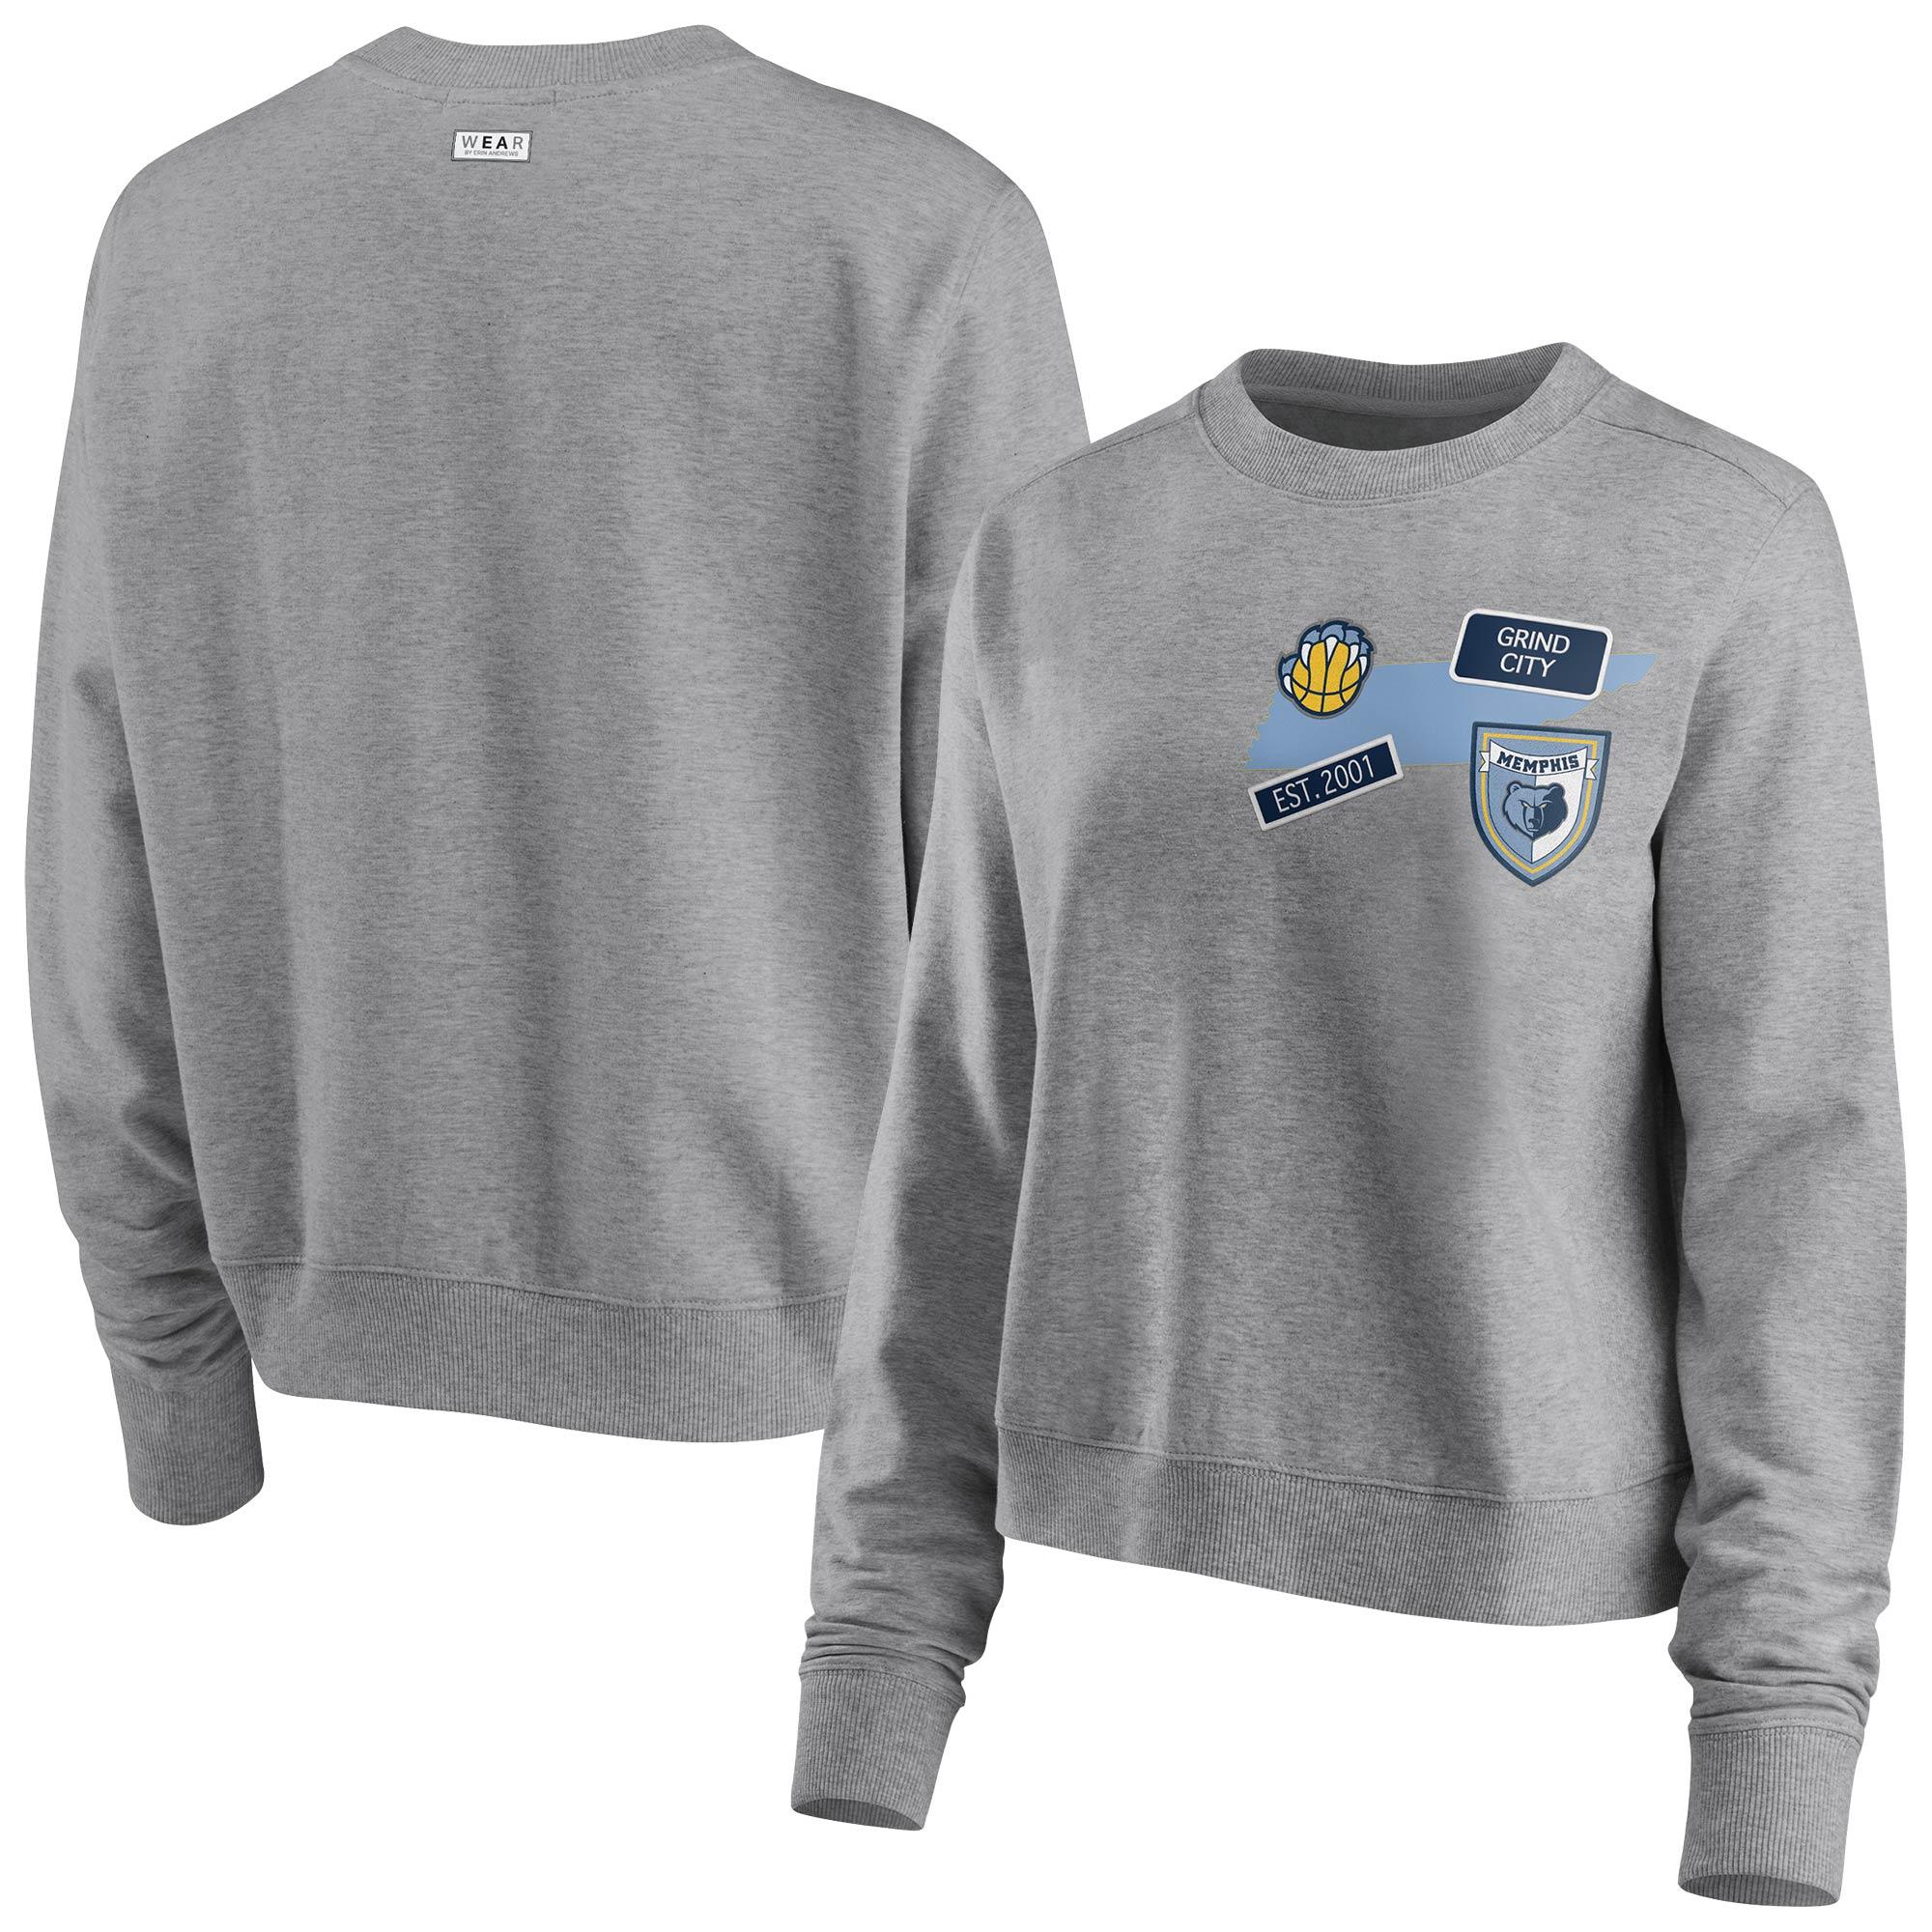 Memphis Grizzlies WEAR by Erin Andrews Women's Patch Applique Pullover Sweatshirt - Heathered Gray